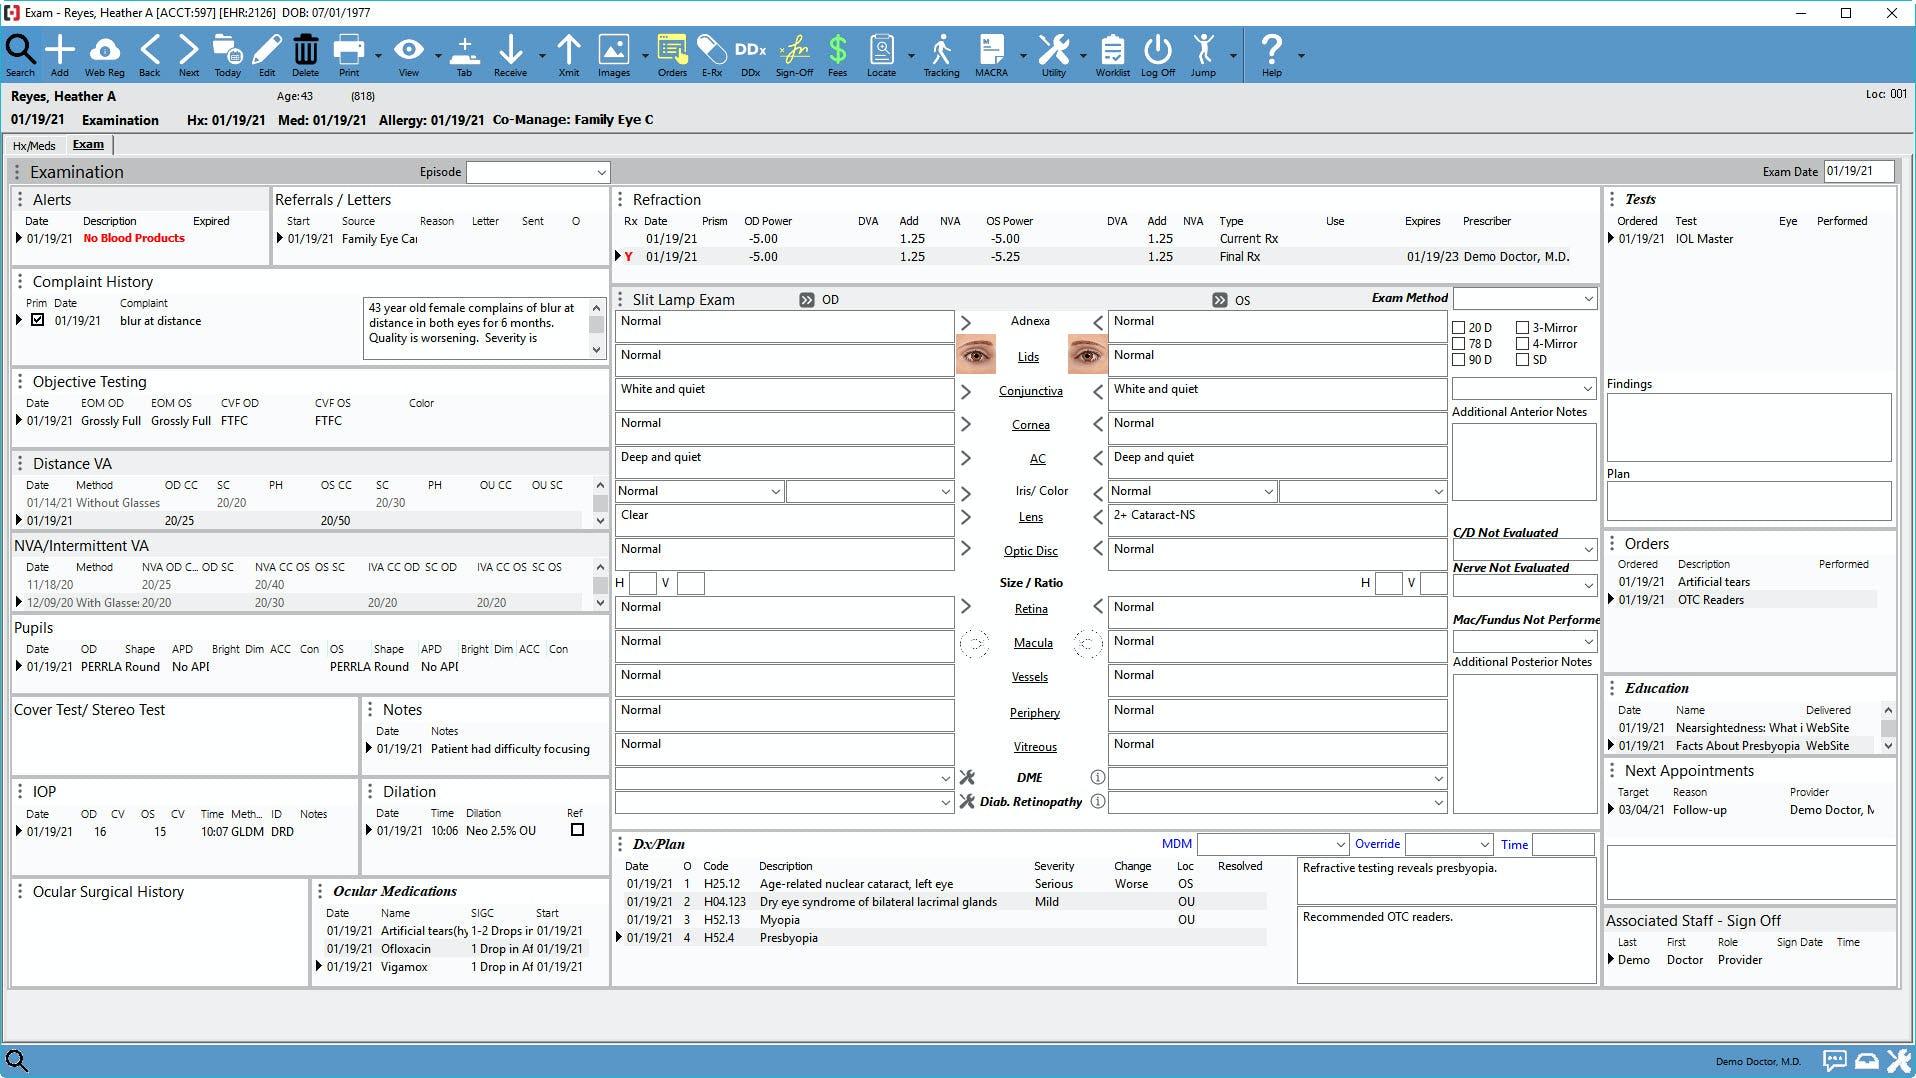 Compulink Healthcare Solutions Software - Eye Care